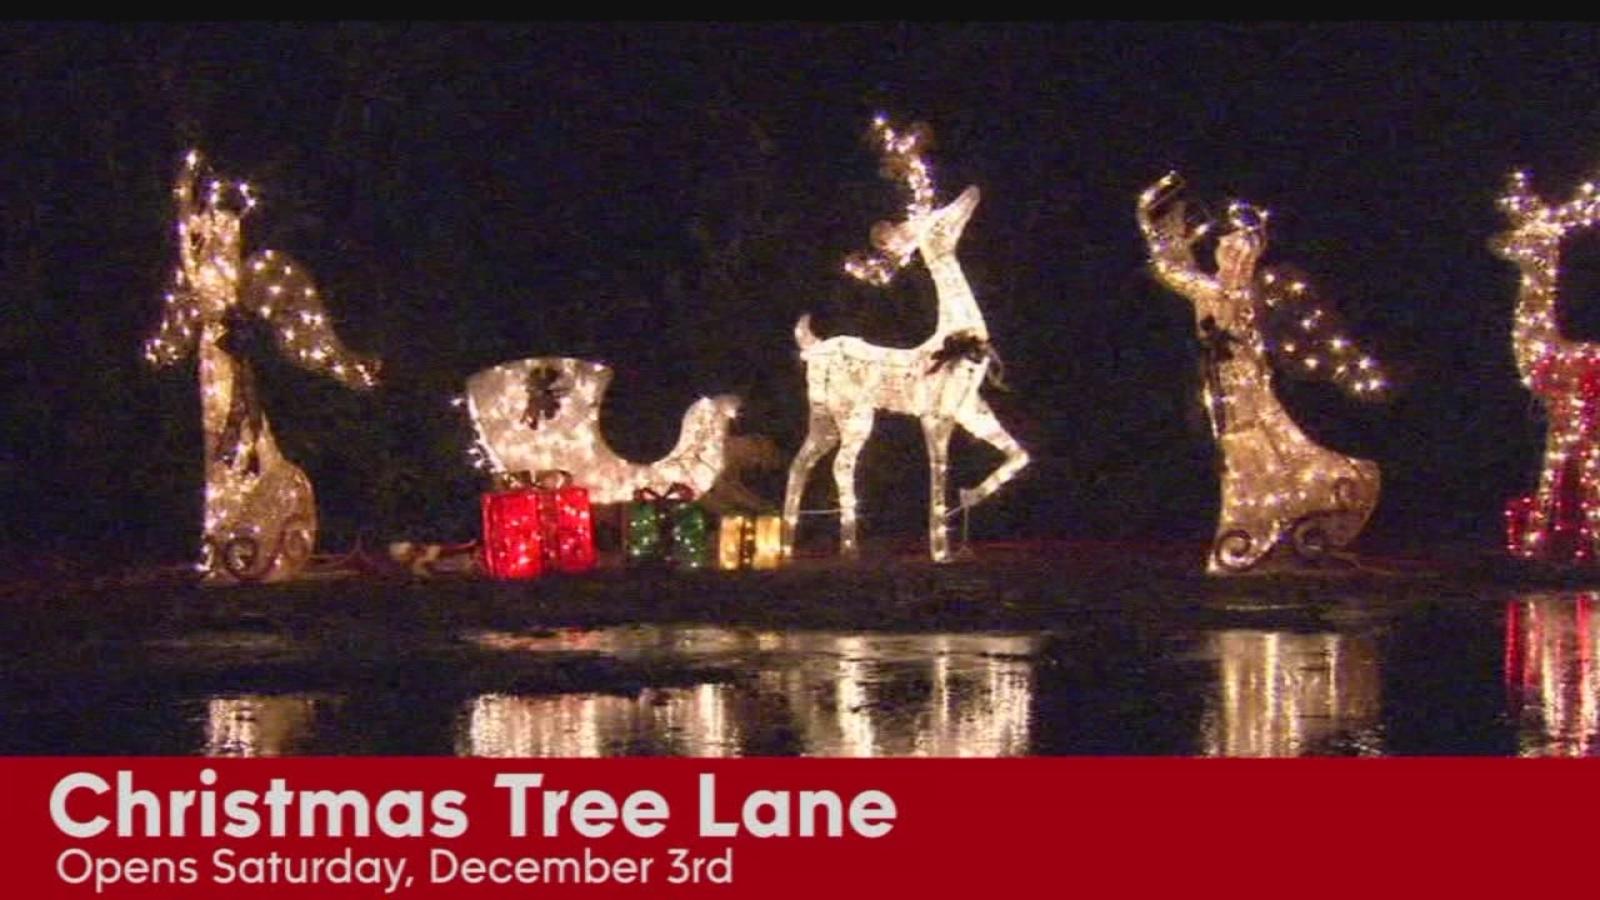 Christmas Tree Lane opens Saturday with walk night - ABC30 Fresno